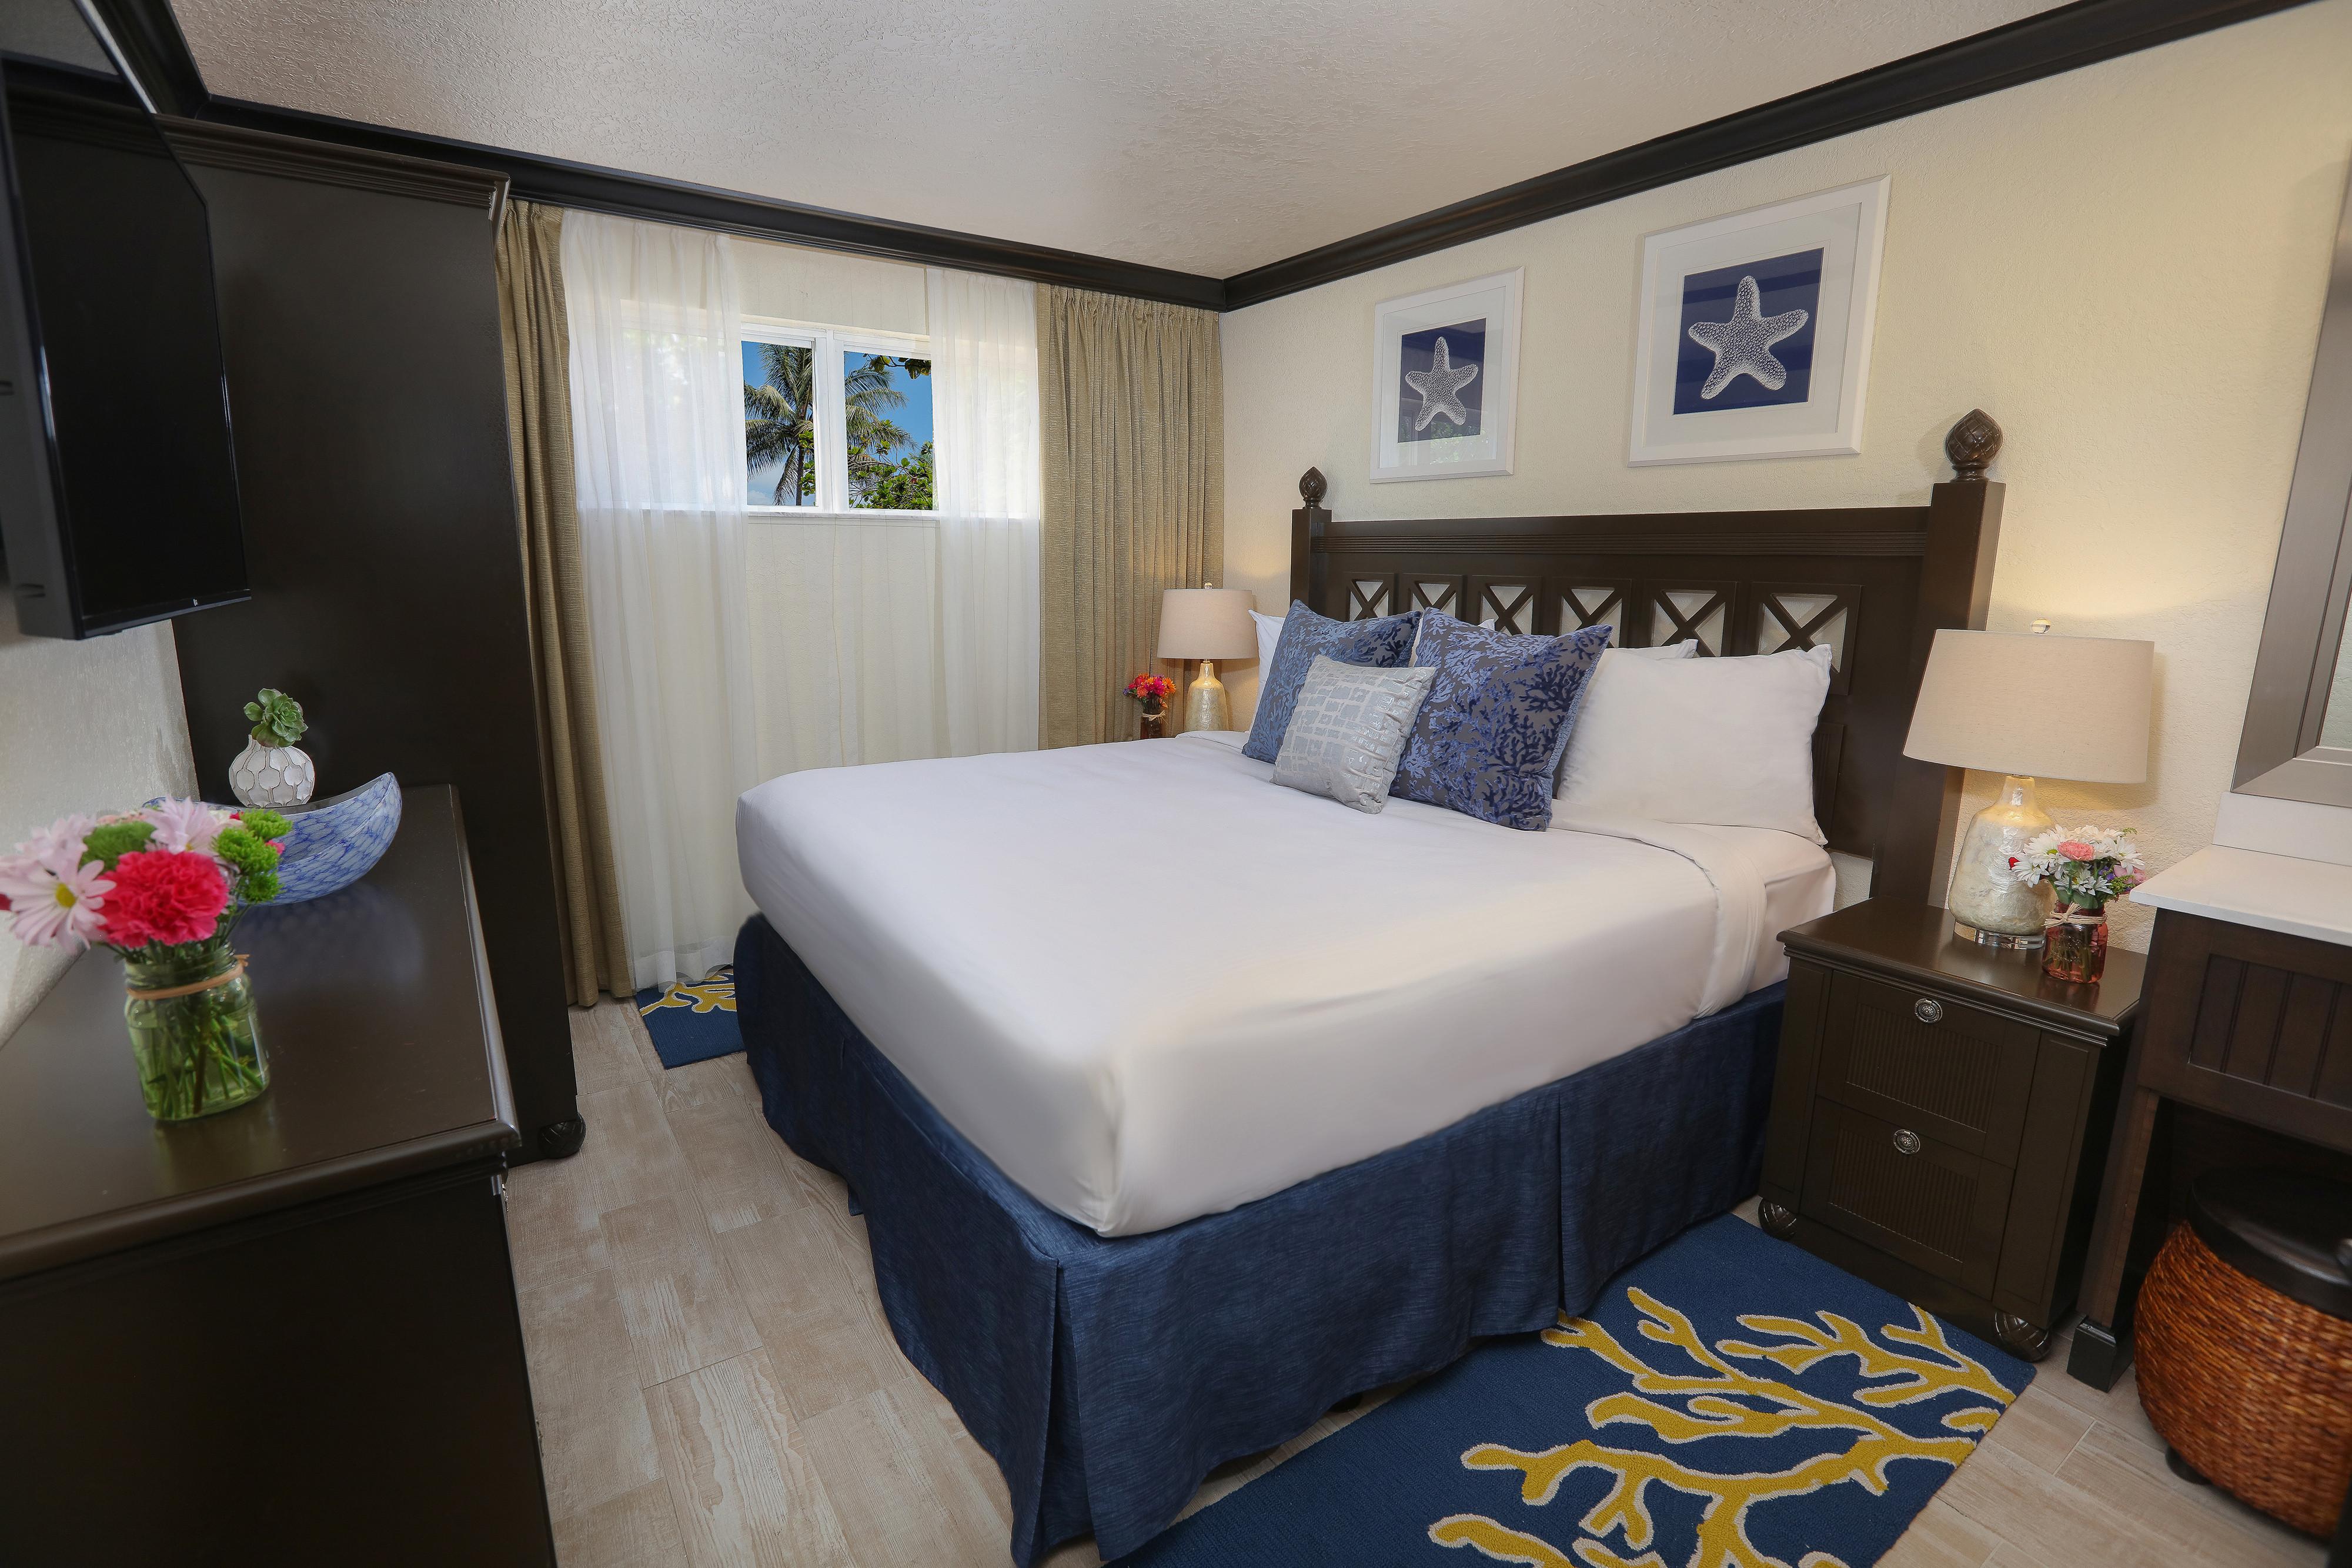 Hotel Room Blocks For Beach Weddings In Florida In Cocoa Beach | Luxury Two-Bedroom Suite